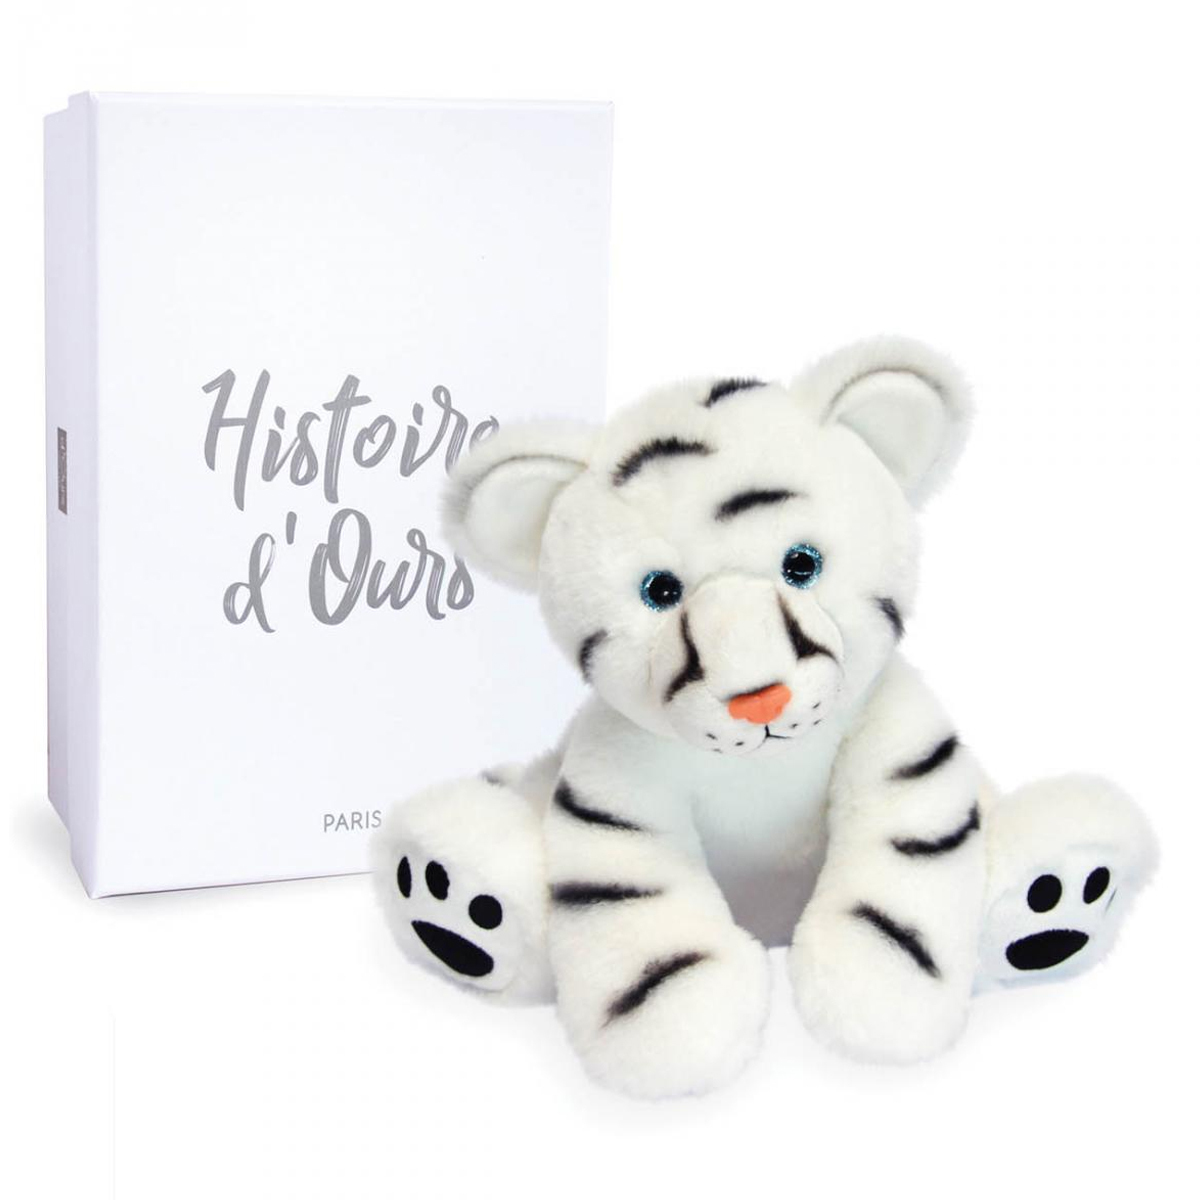 Peluche Bébé Tigre Blanc - Terre sauvage Peluche Tigre Blanc 25 cm